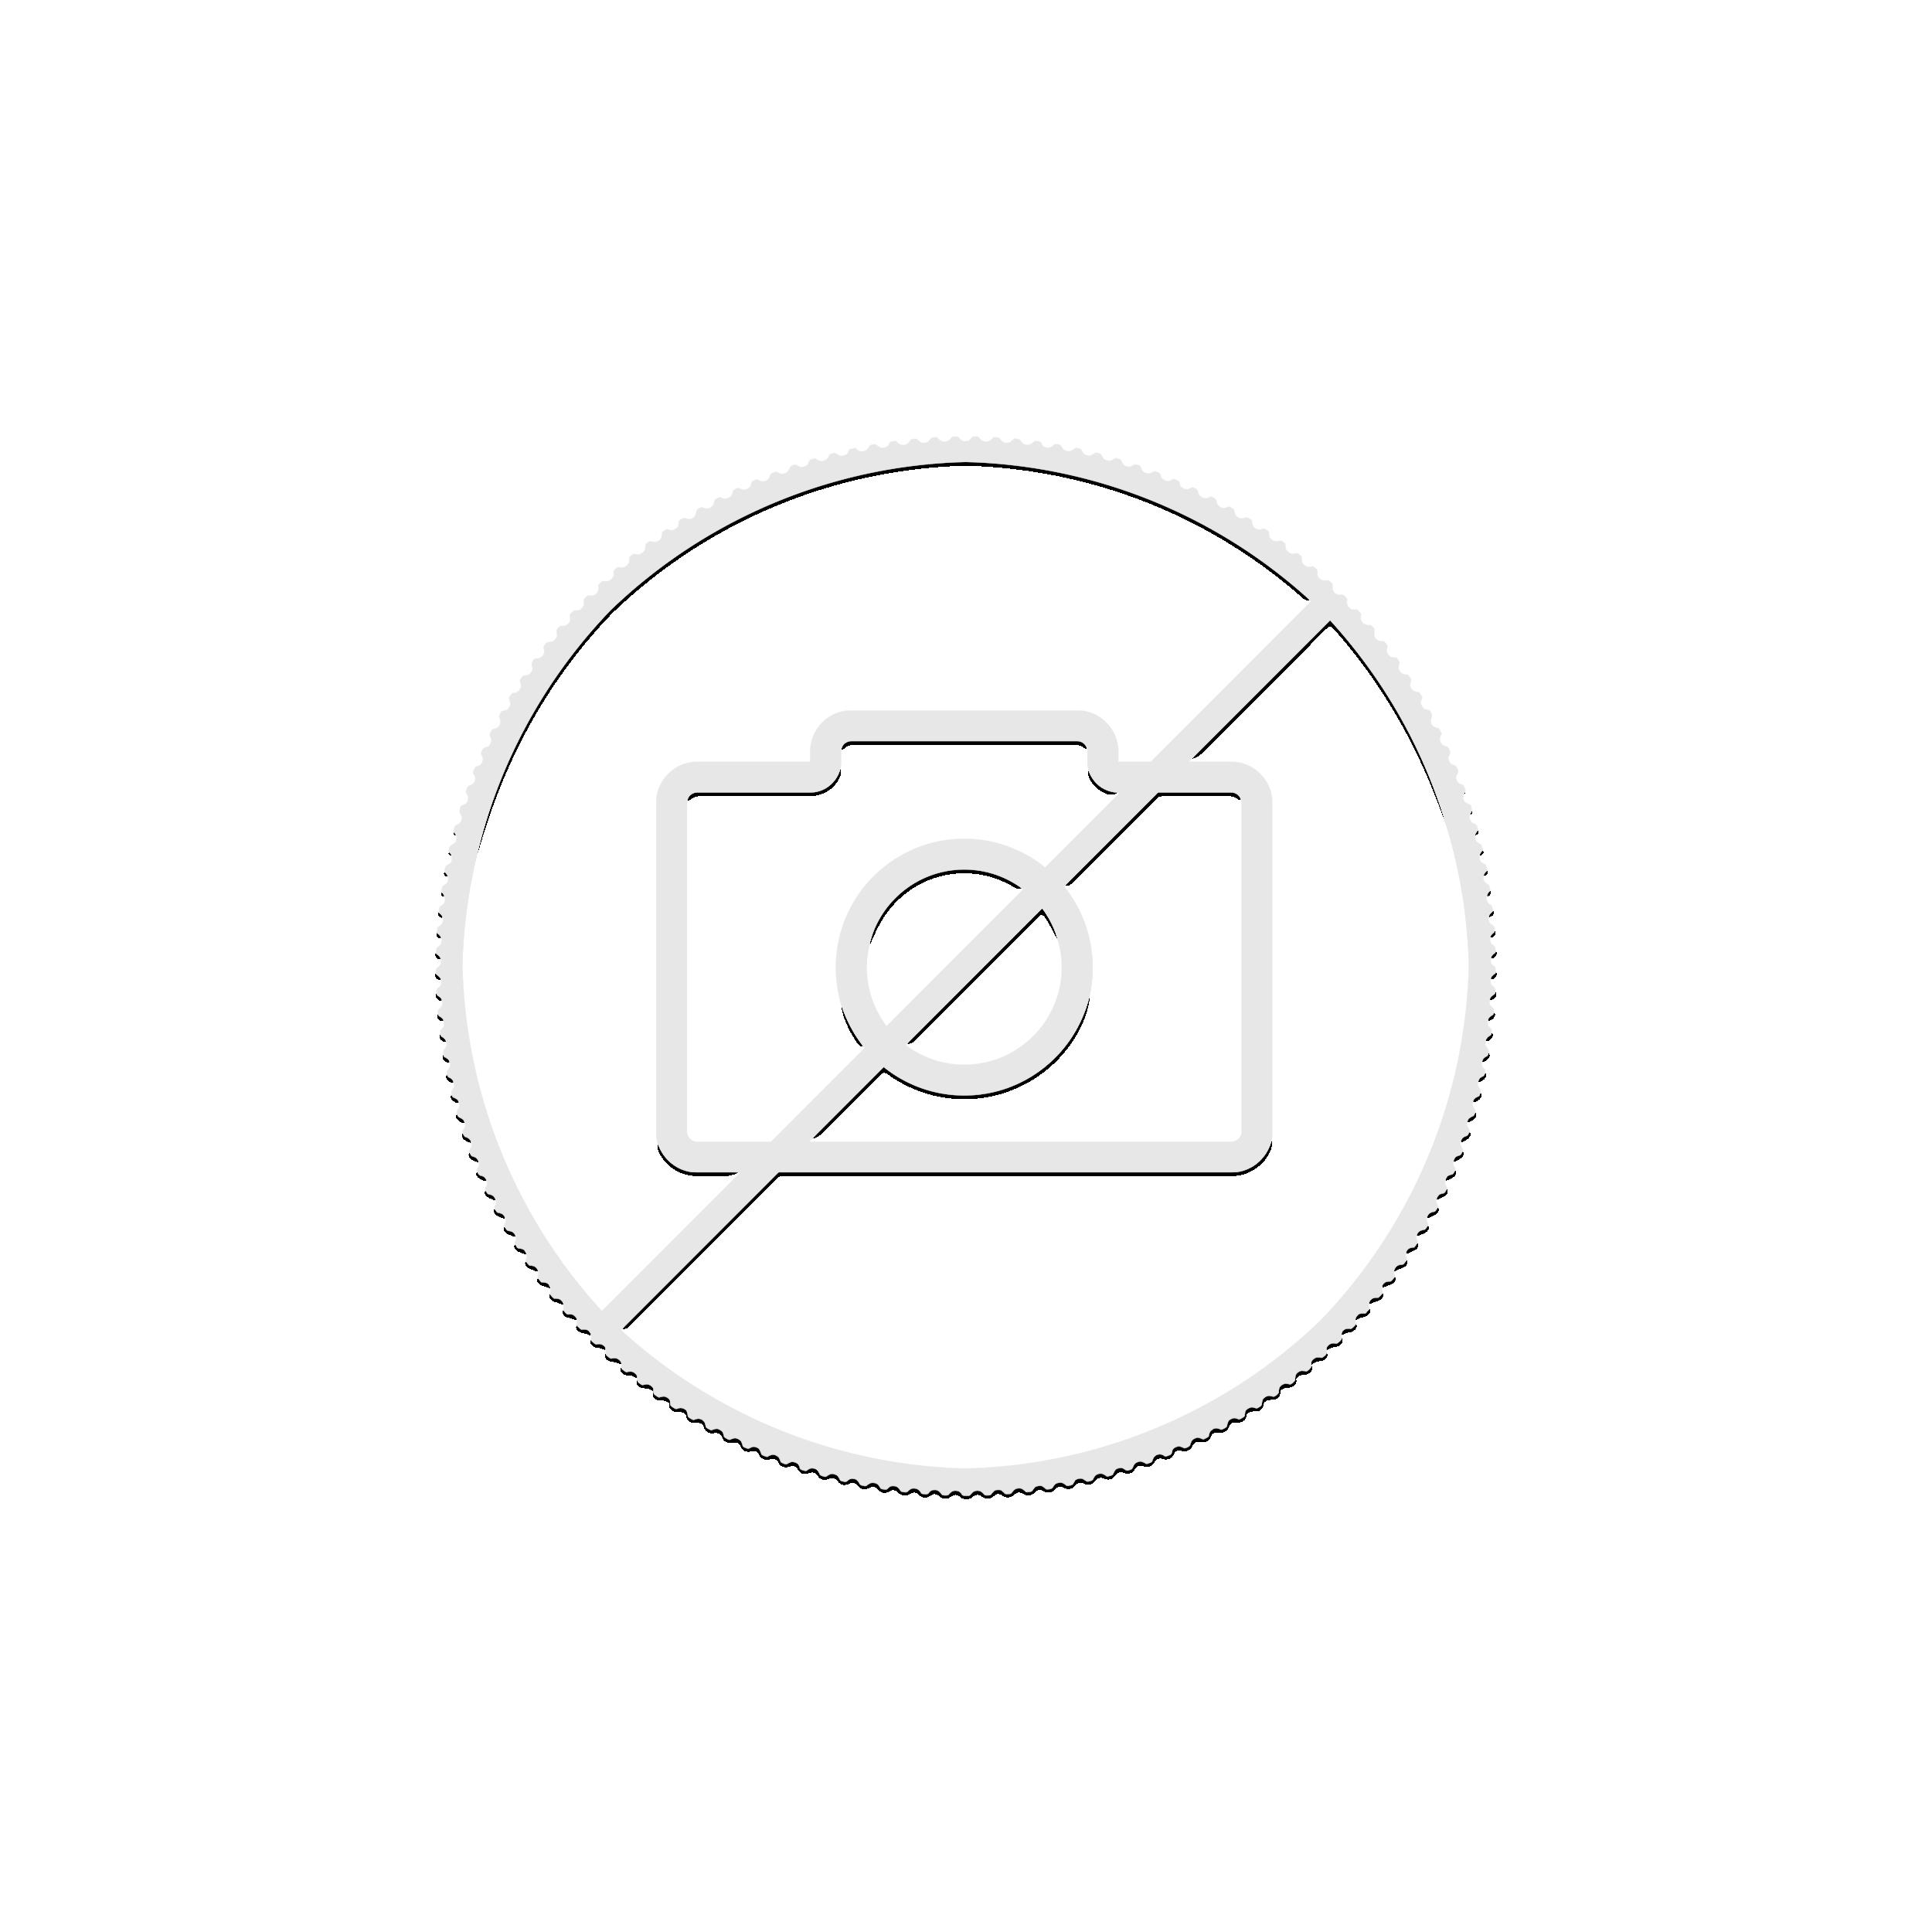 1 Troy ounce gouden munt Emoe 2019 achterzijde